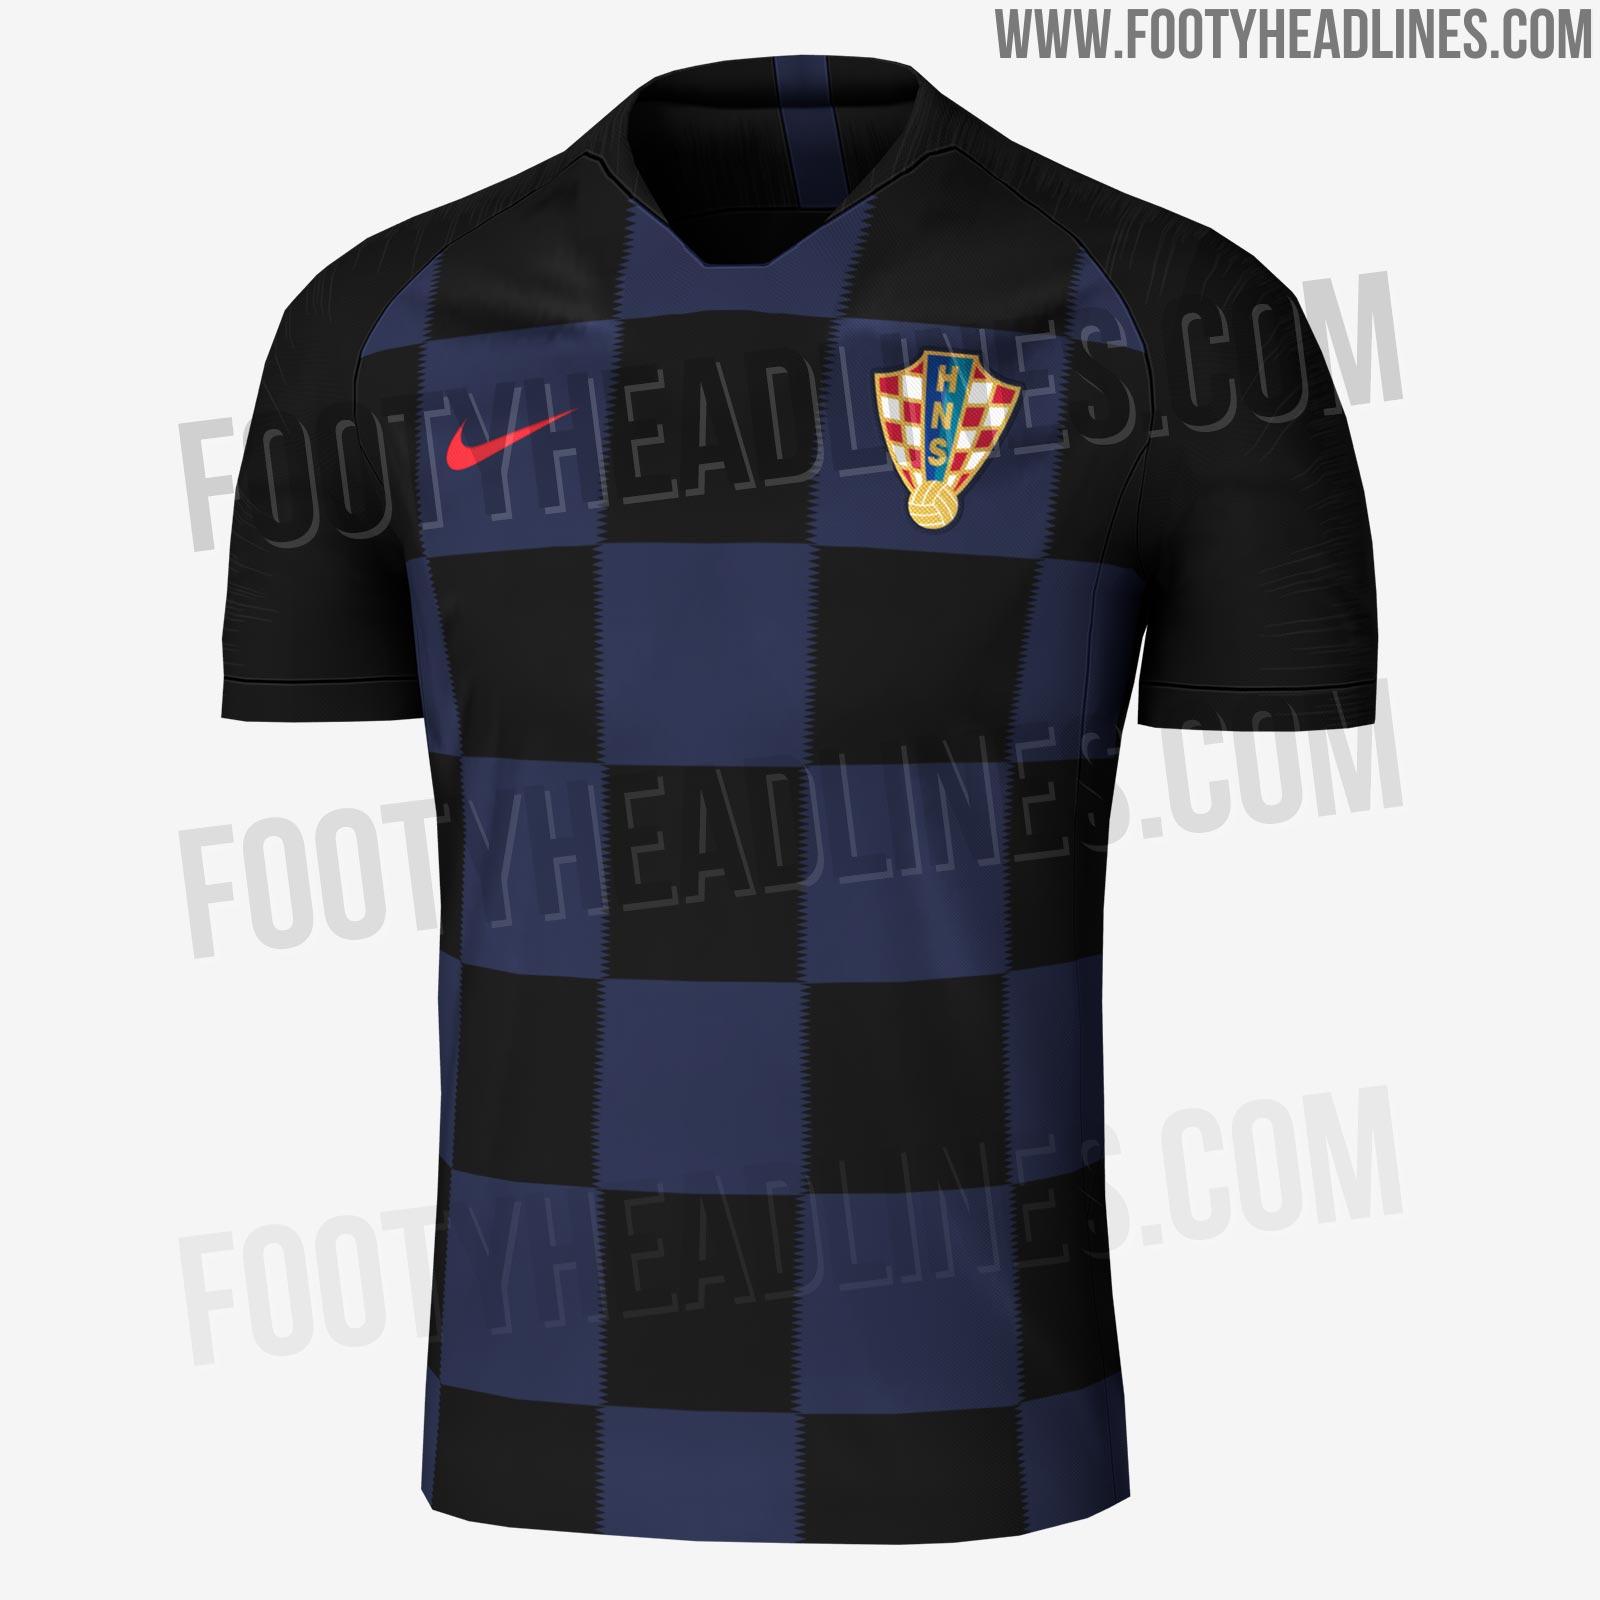 croatia-2018-world-cup-away-kit-2.jpg